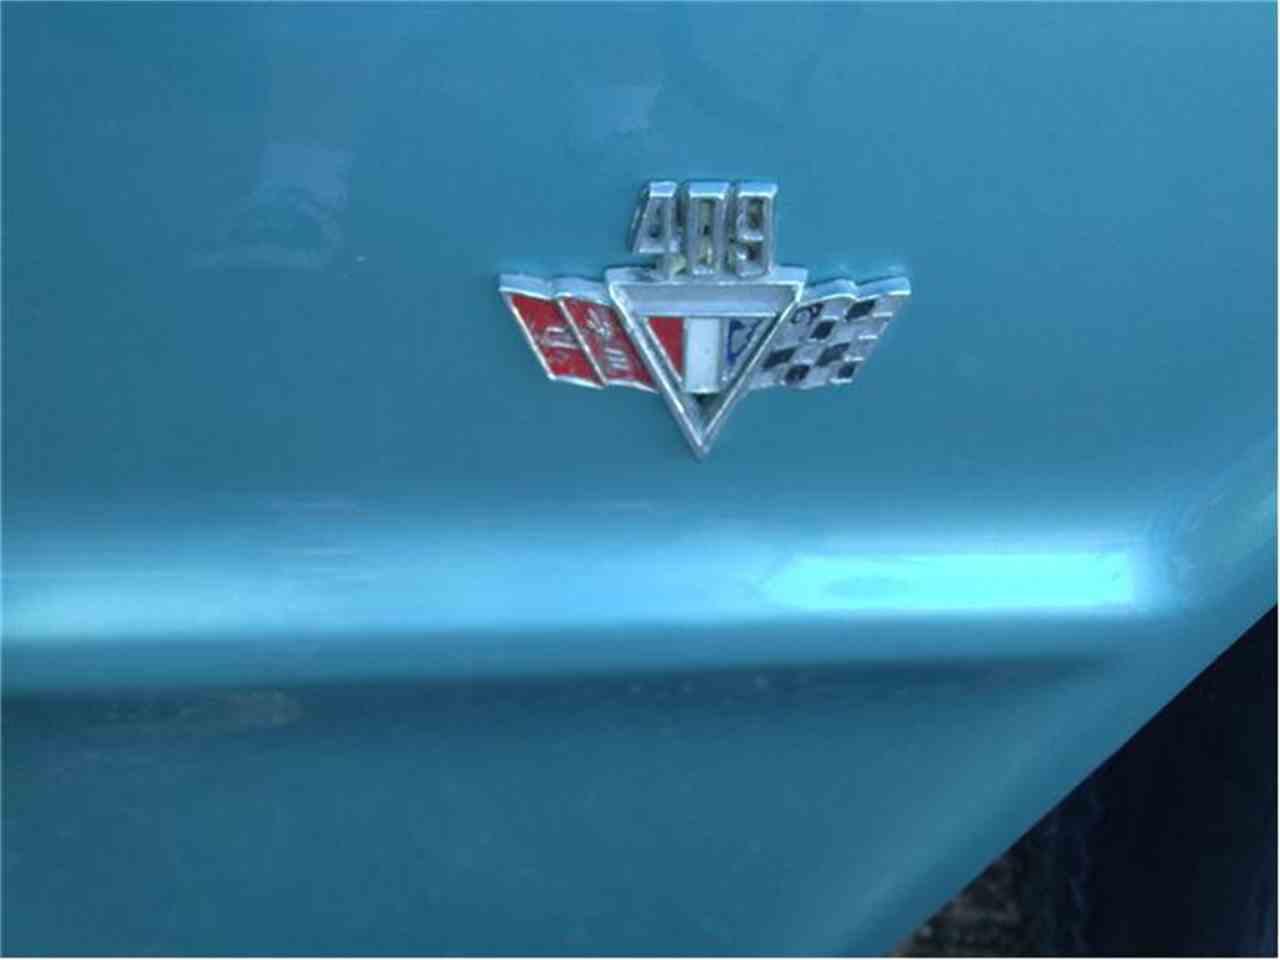 Large Picture of Classic 1964 Impala SS located in Quartzsite Arizona - $58,980.00 - 9OT6